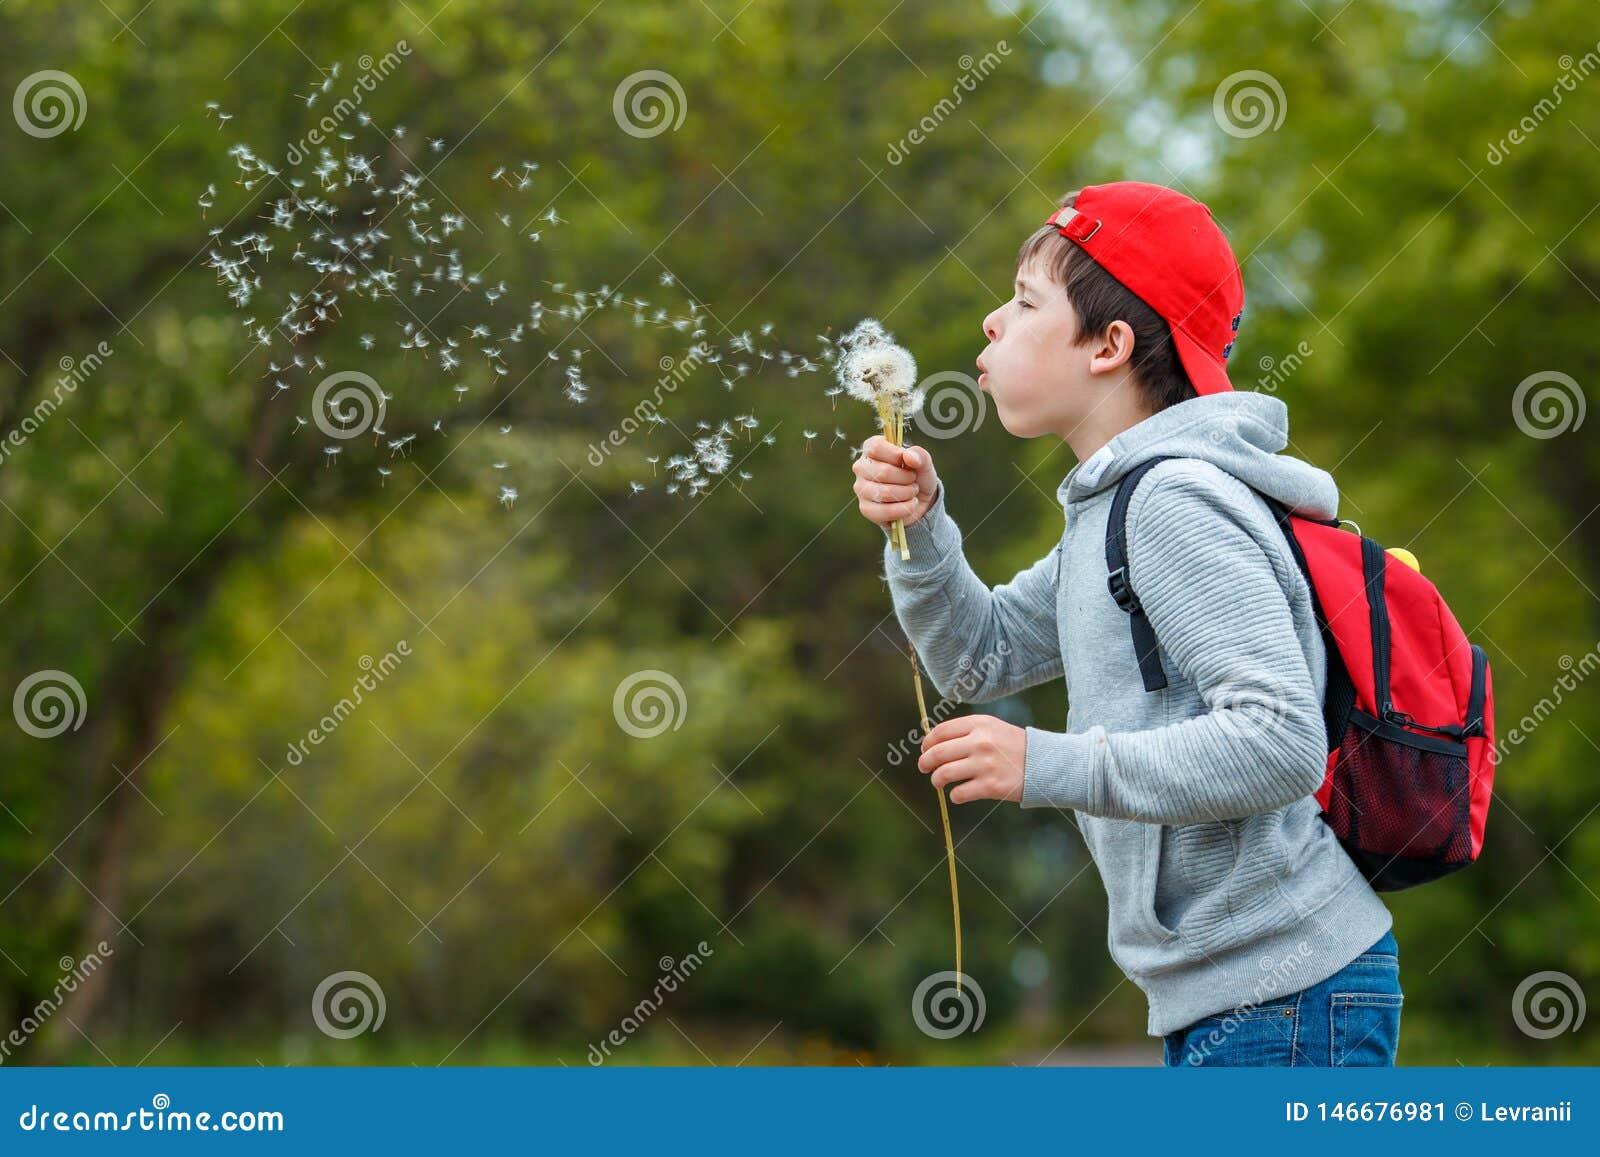 Happy child blowing dandelion flower outdoors. Boy having fun in spring park. Blurred green background